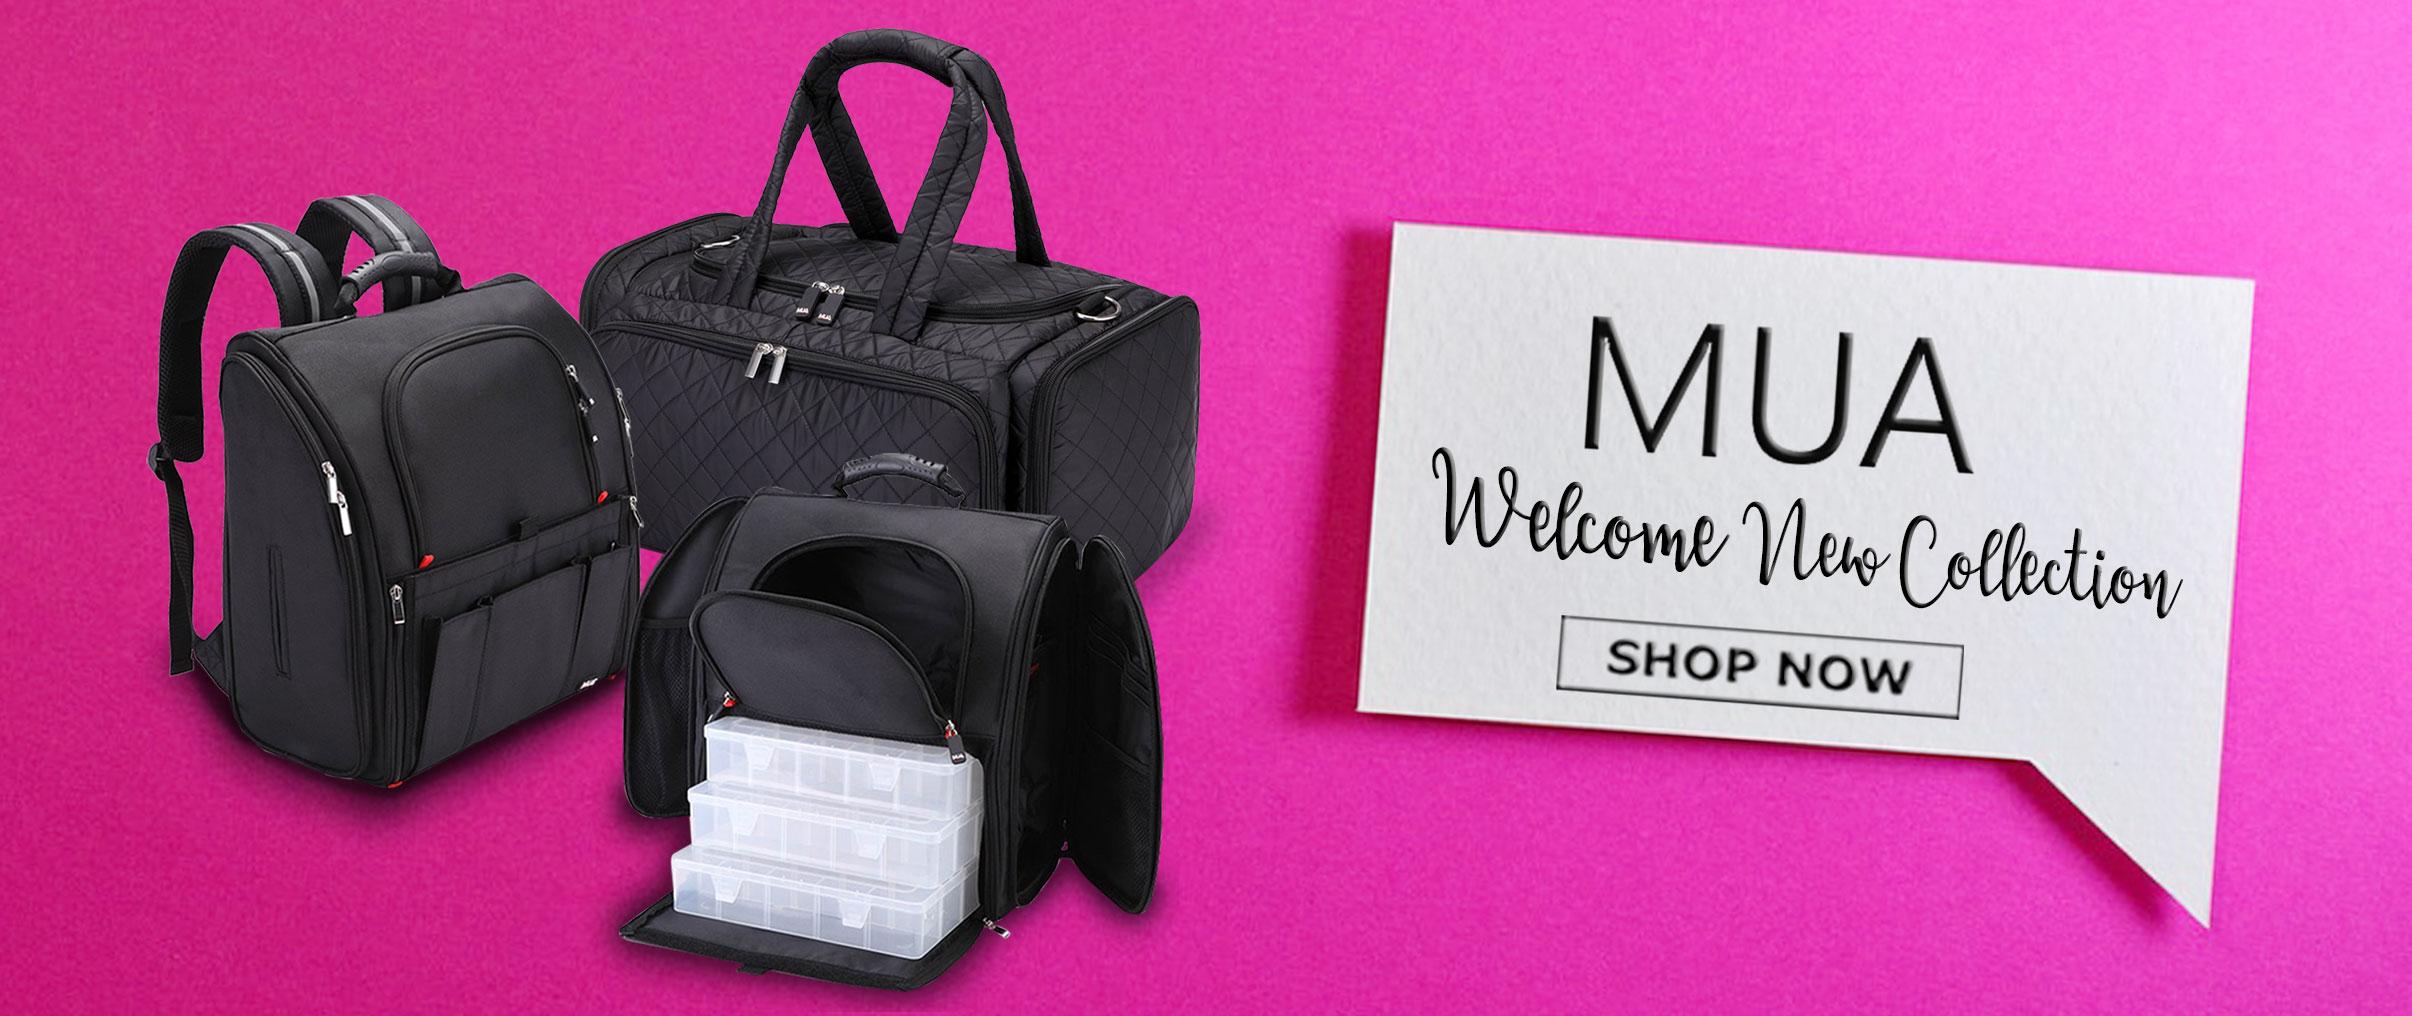 a2cc9d0d83 Η Mua αποτελεί κορυφαίο σχεδιαστή στις επαγγελματικές βαλίτσες αποθήκευσης